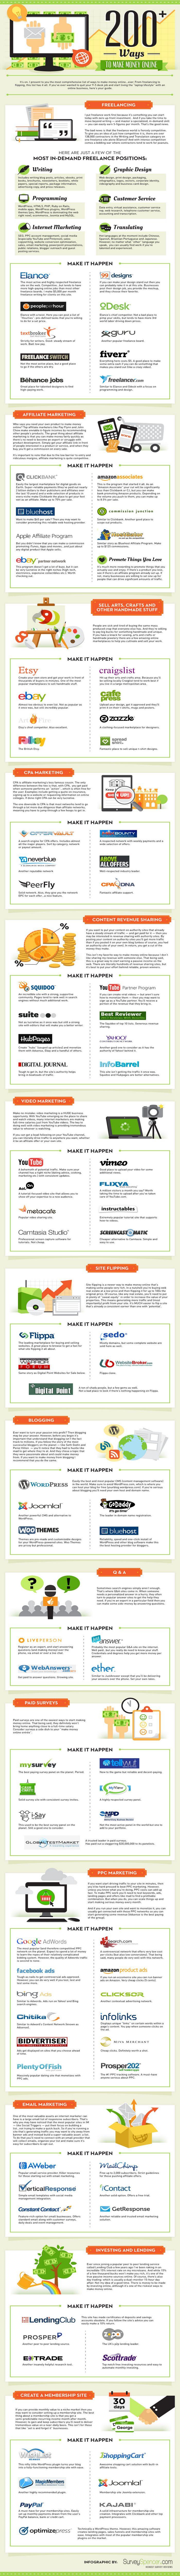 200 Ways to Make Money Online   Infographic